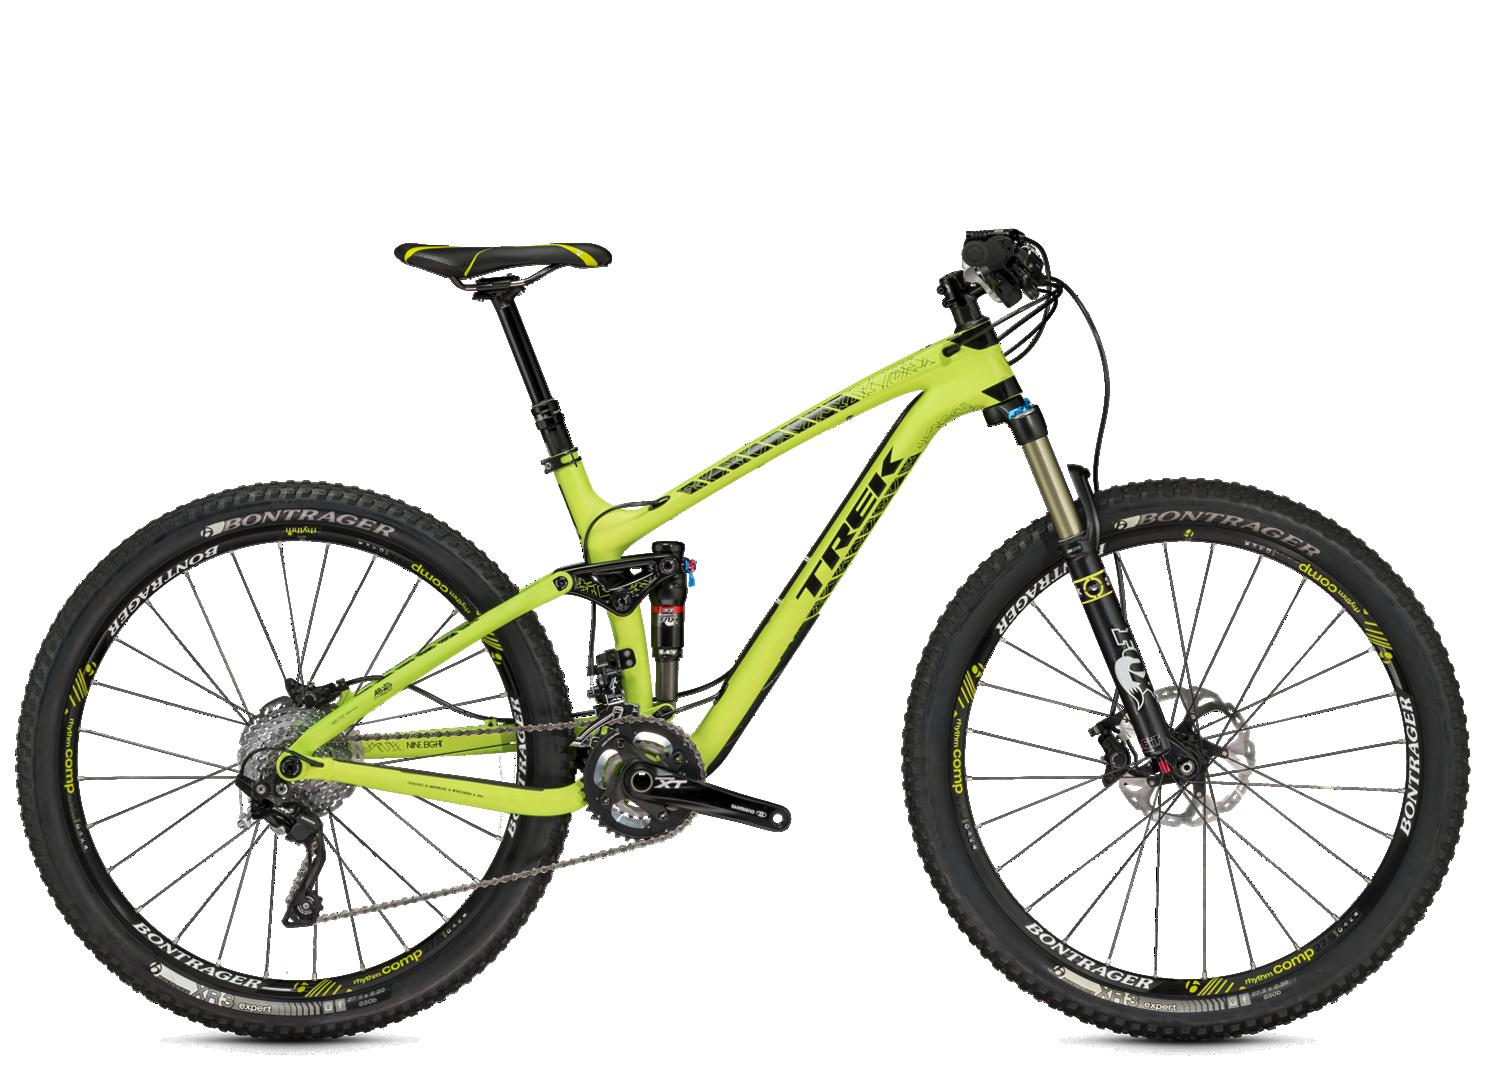 7c37d776635 2015 Fuel EX 9.8 27.5 - Bike Archive - Trek Bicycle